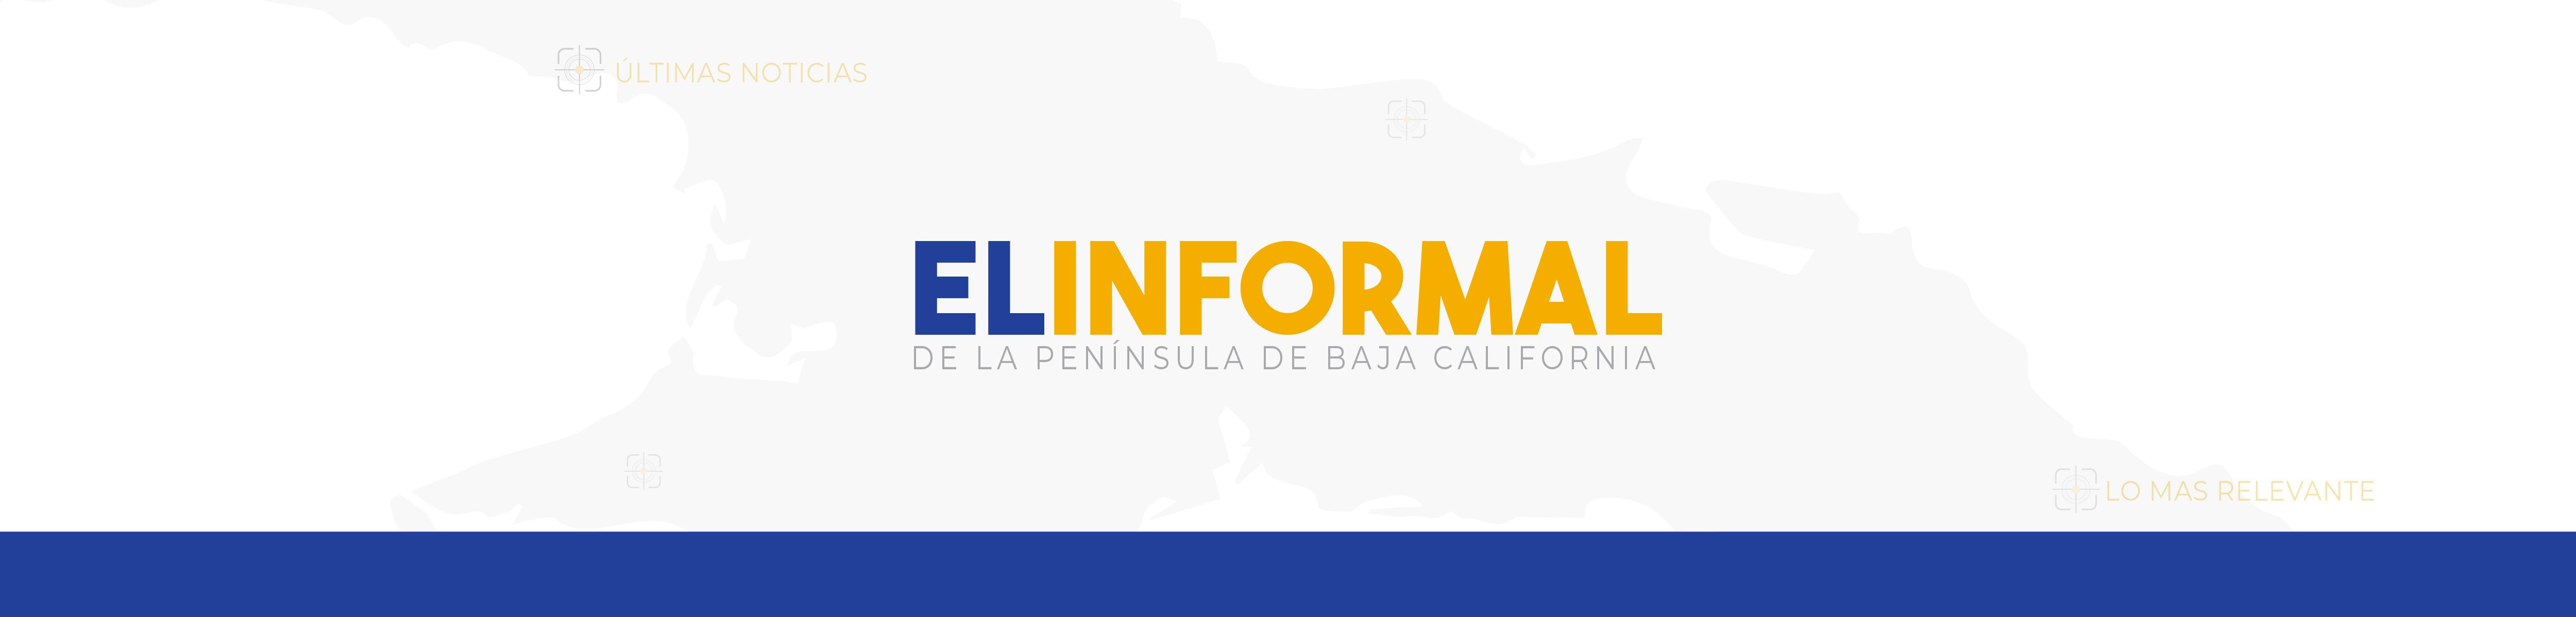 El Informal de Baja California